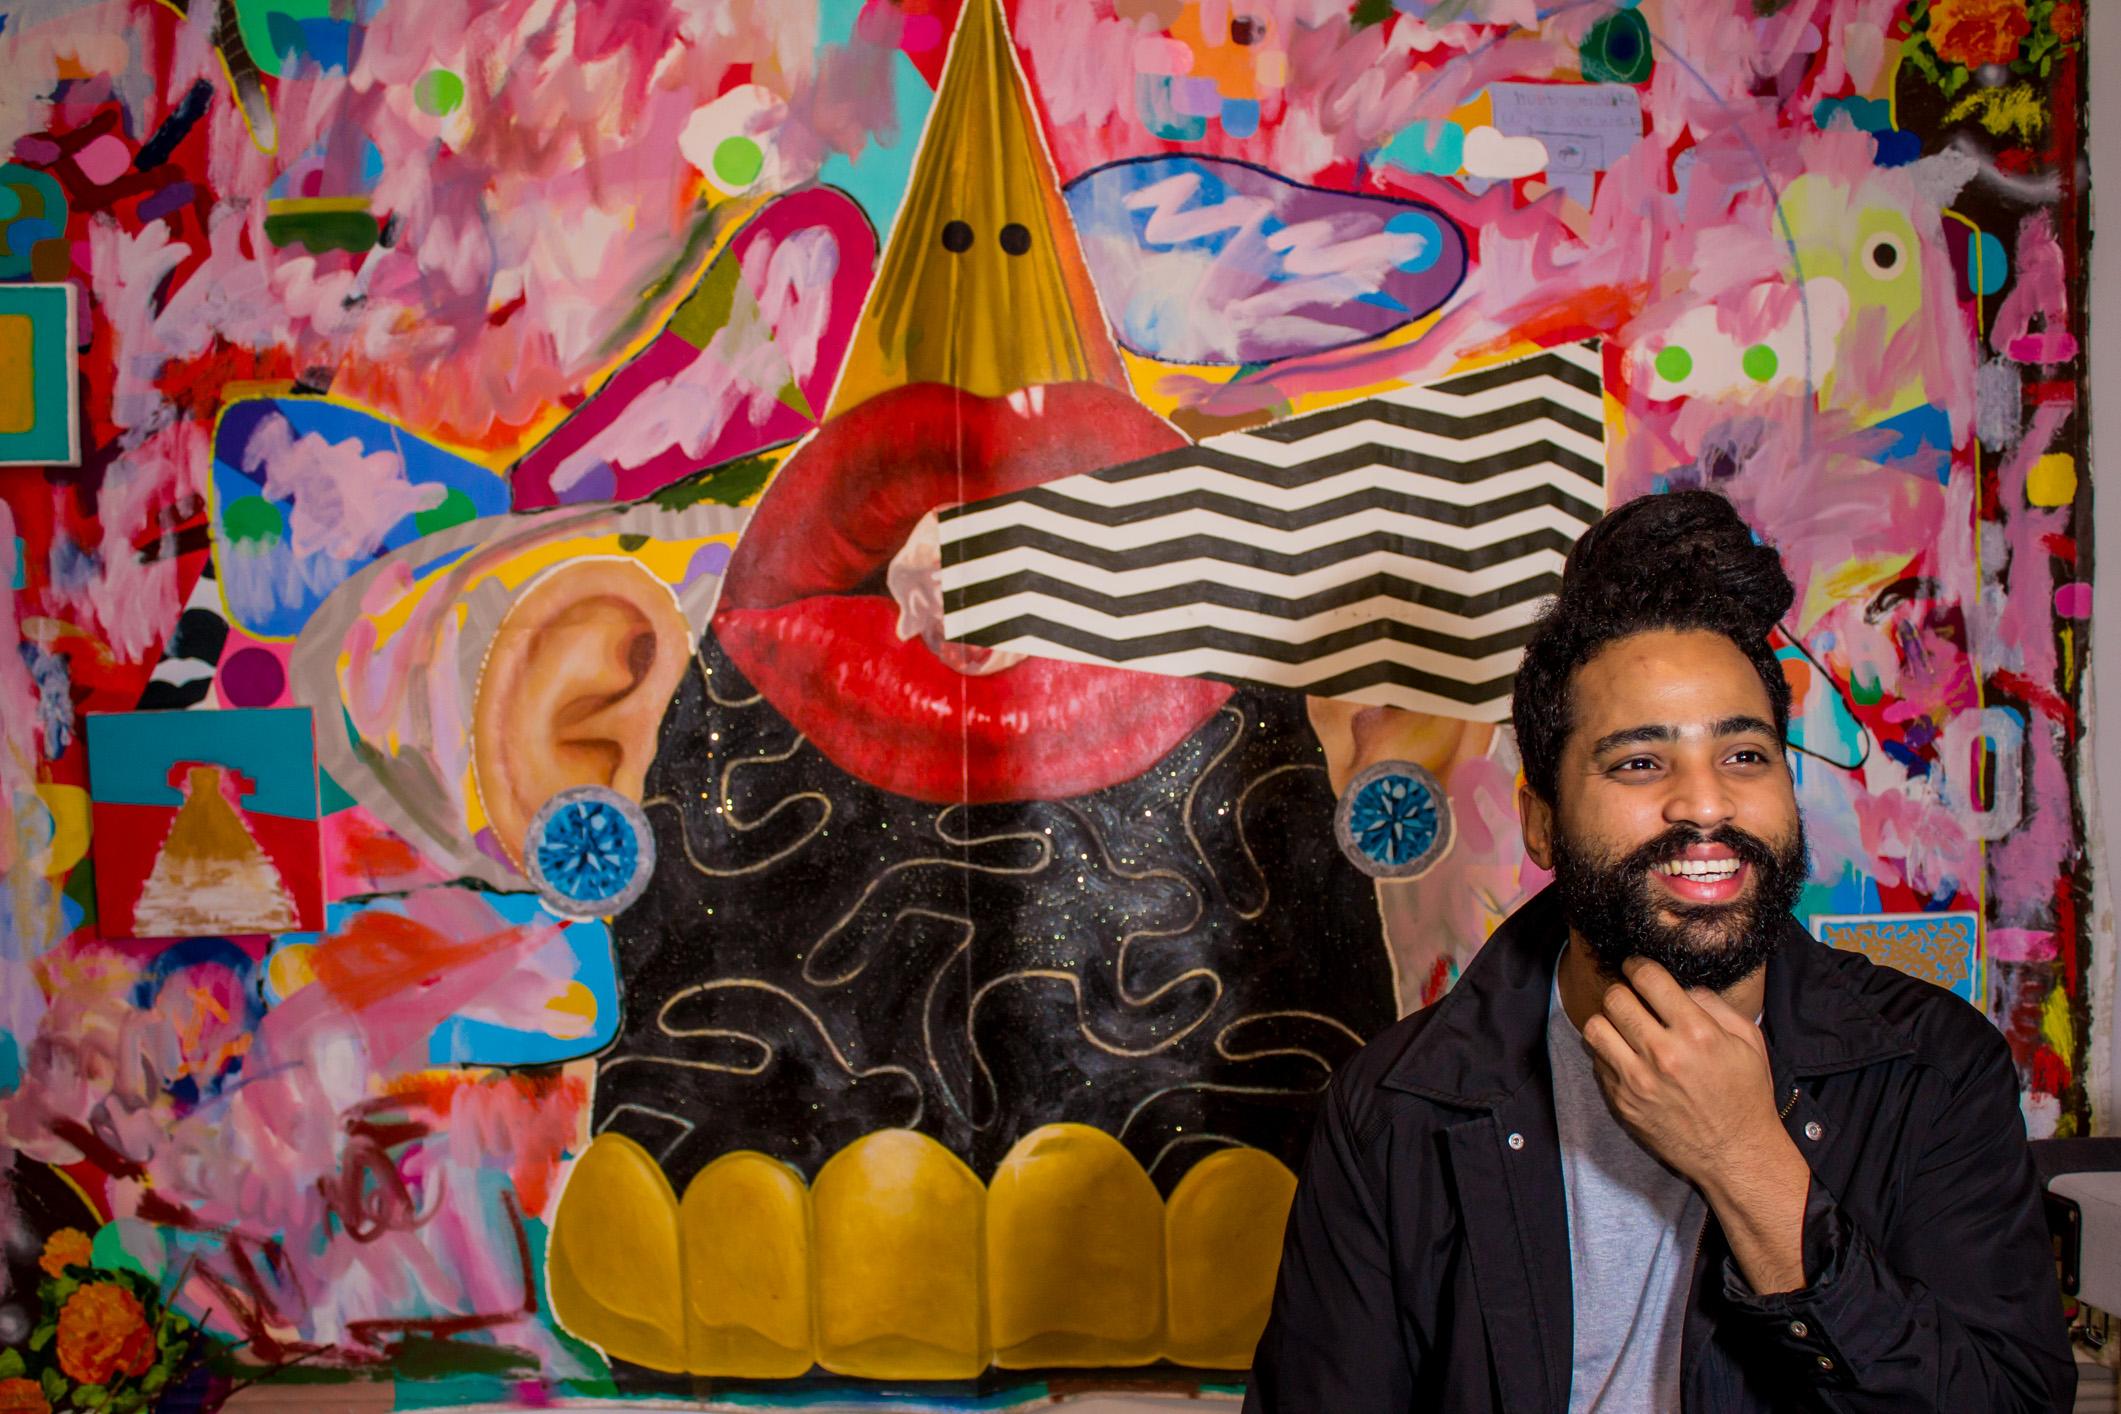 Baéz in front of a work by José Delgado Zúñiga, in Washington Heights, NYC, 2019. Portrait by Magdiel Báez.